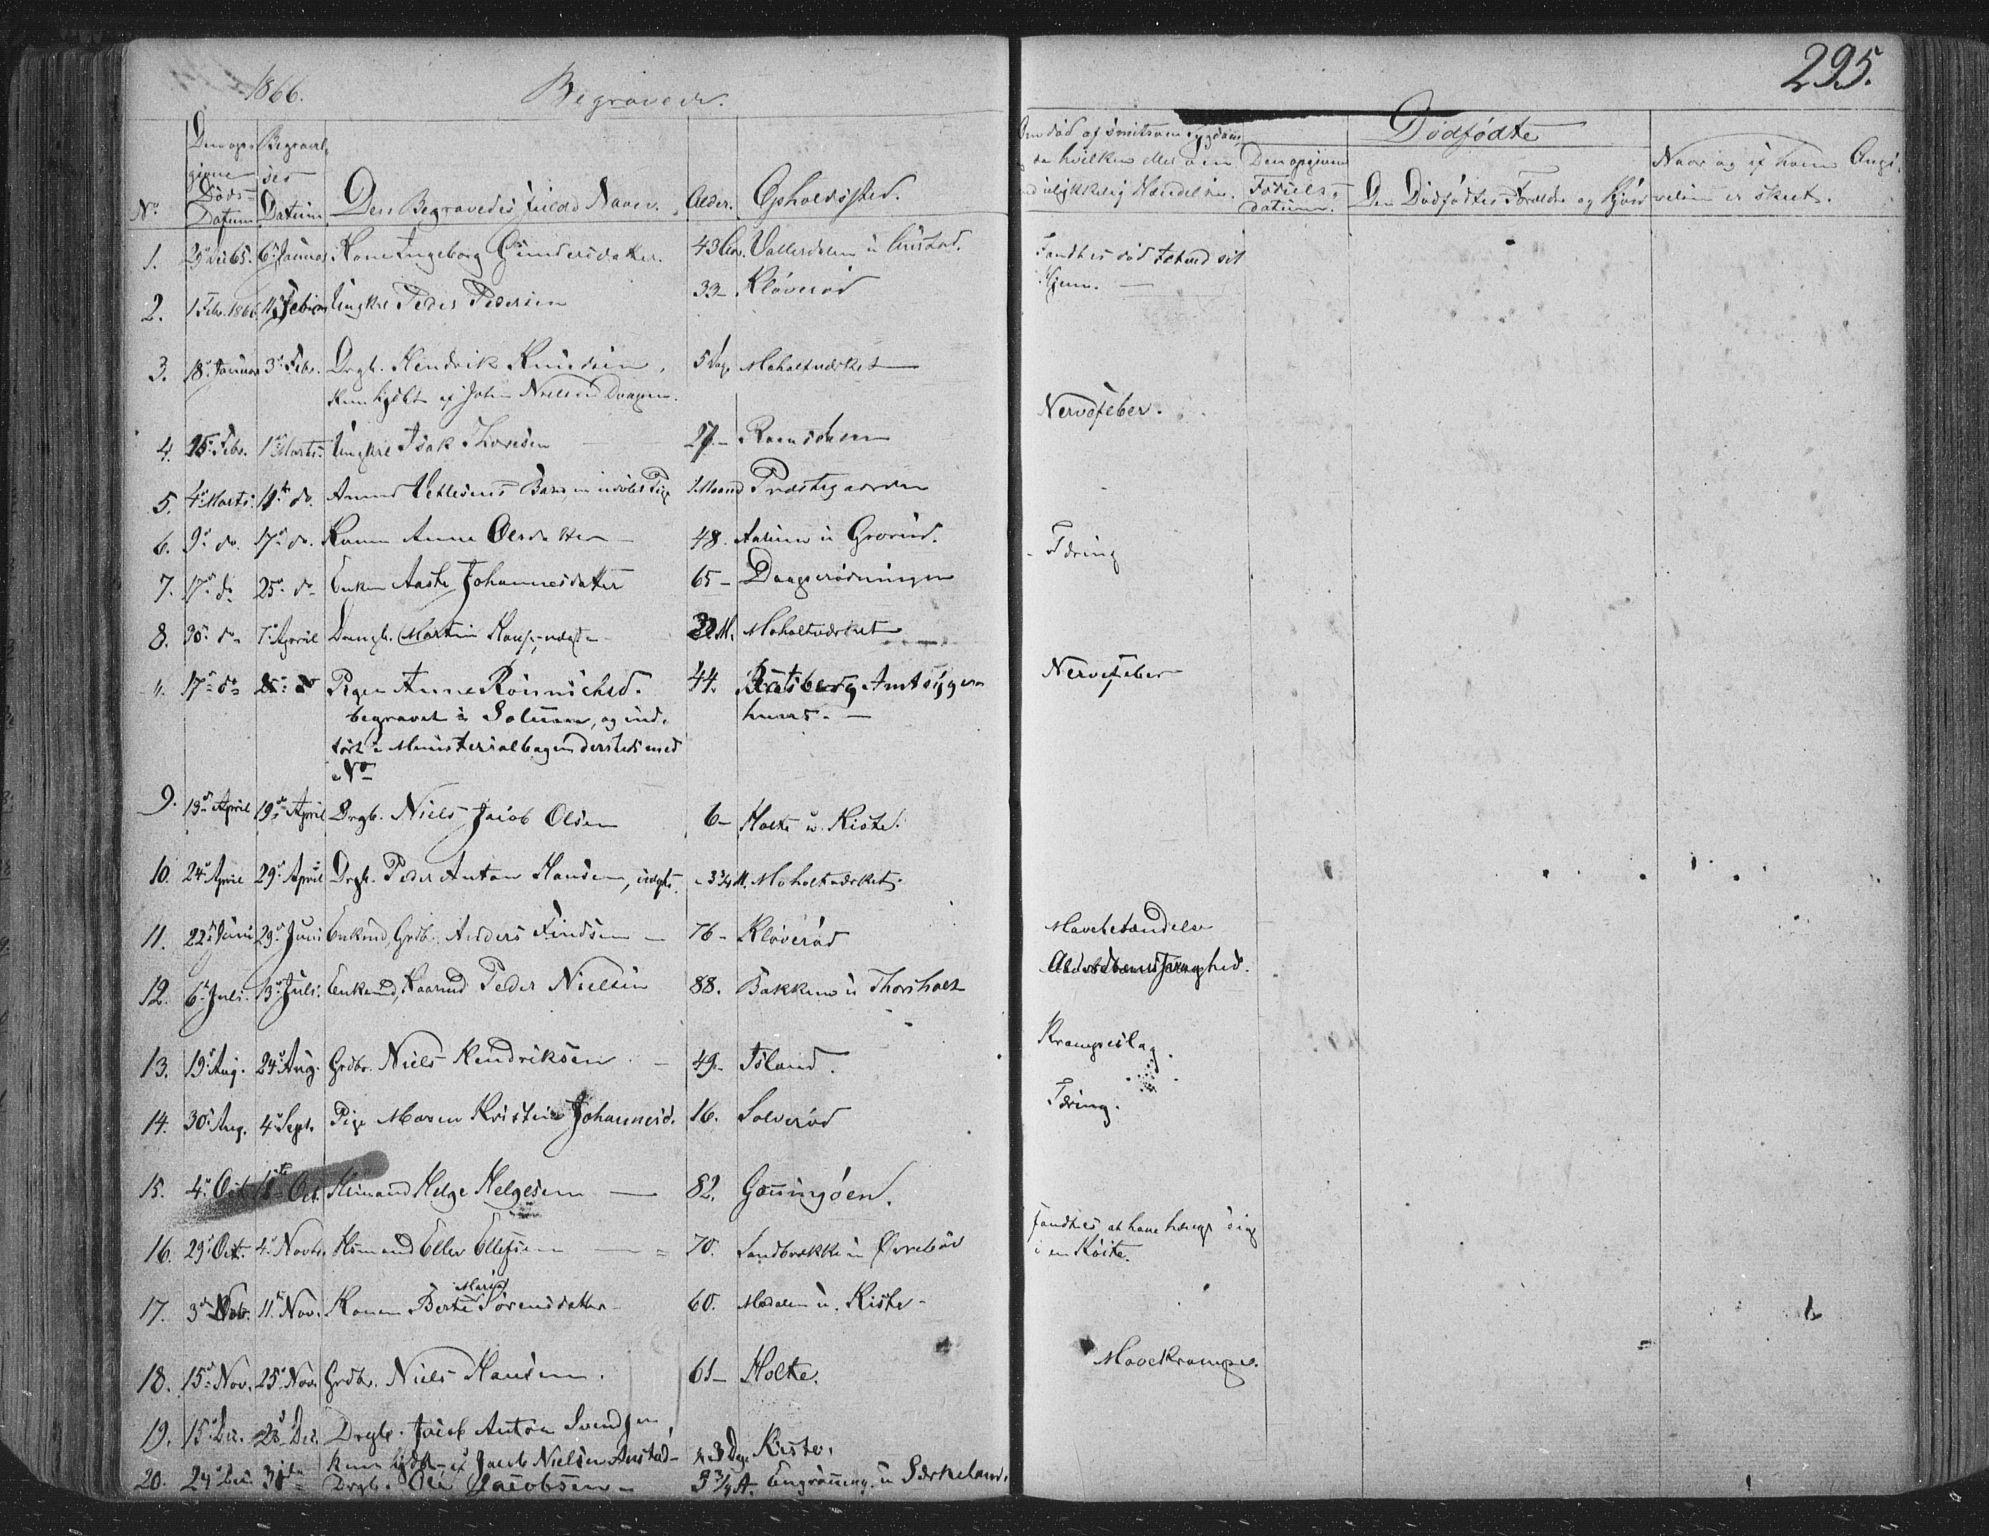 SAKO, Siljan kirkebøker, F/Fa/L0001: Parish register (official) no. 1, 1831-1870, p. 295